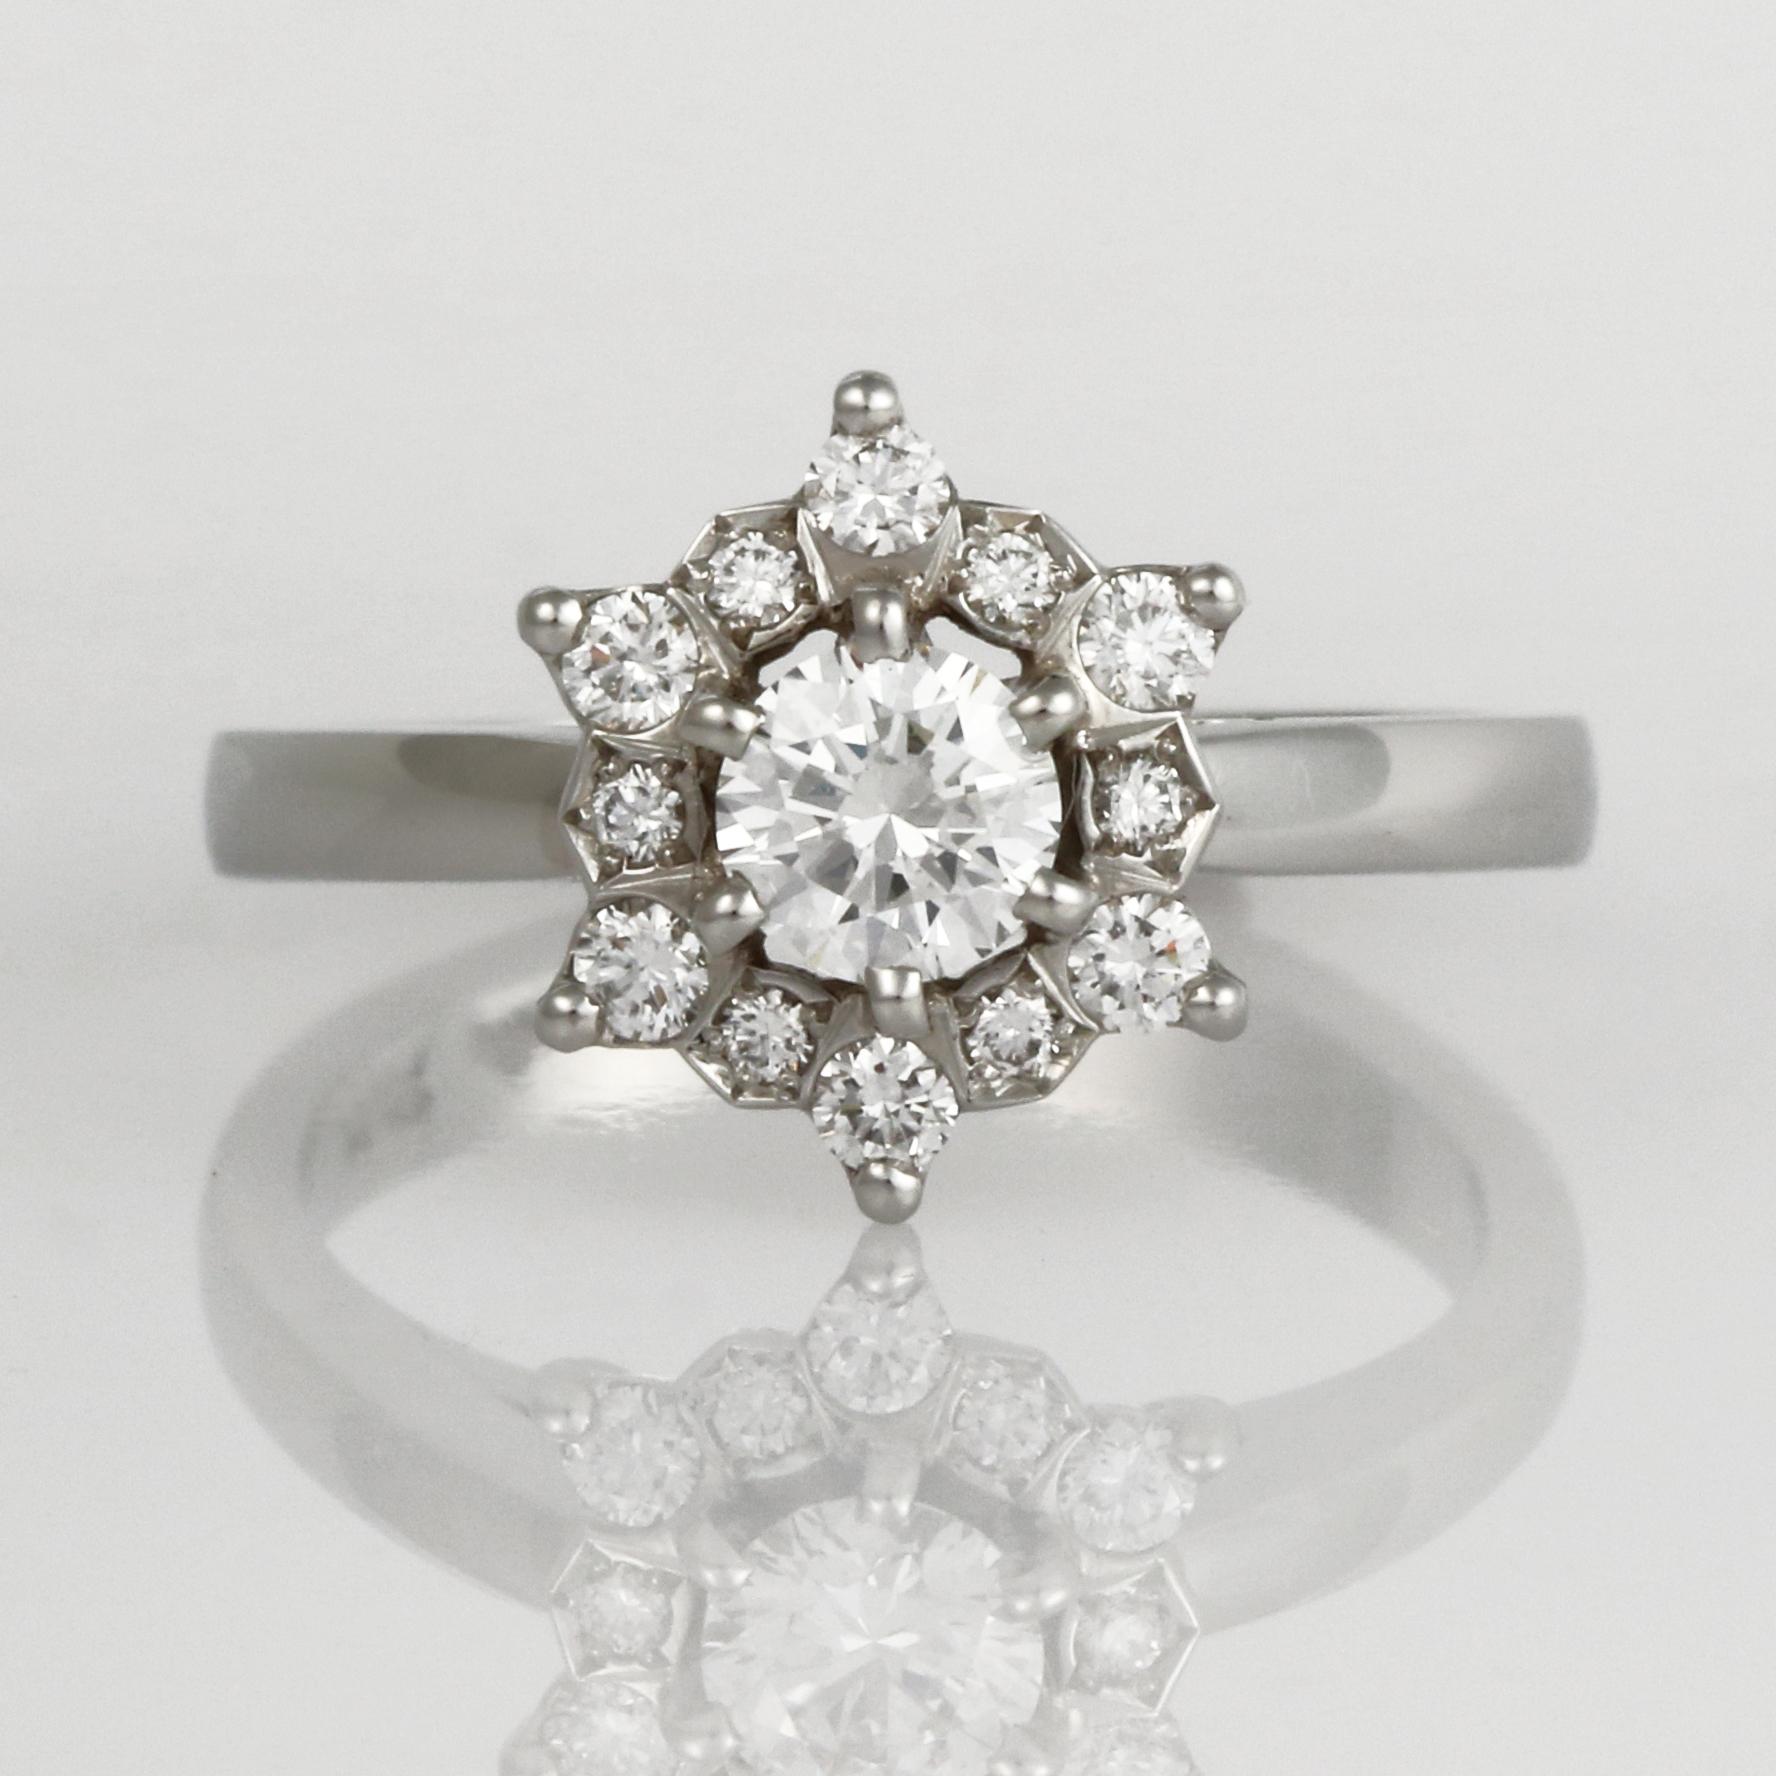 Handmade ladies platinum and diamond engagement ring